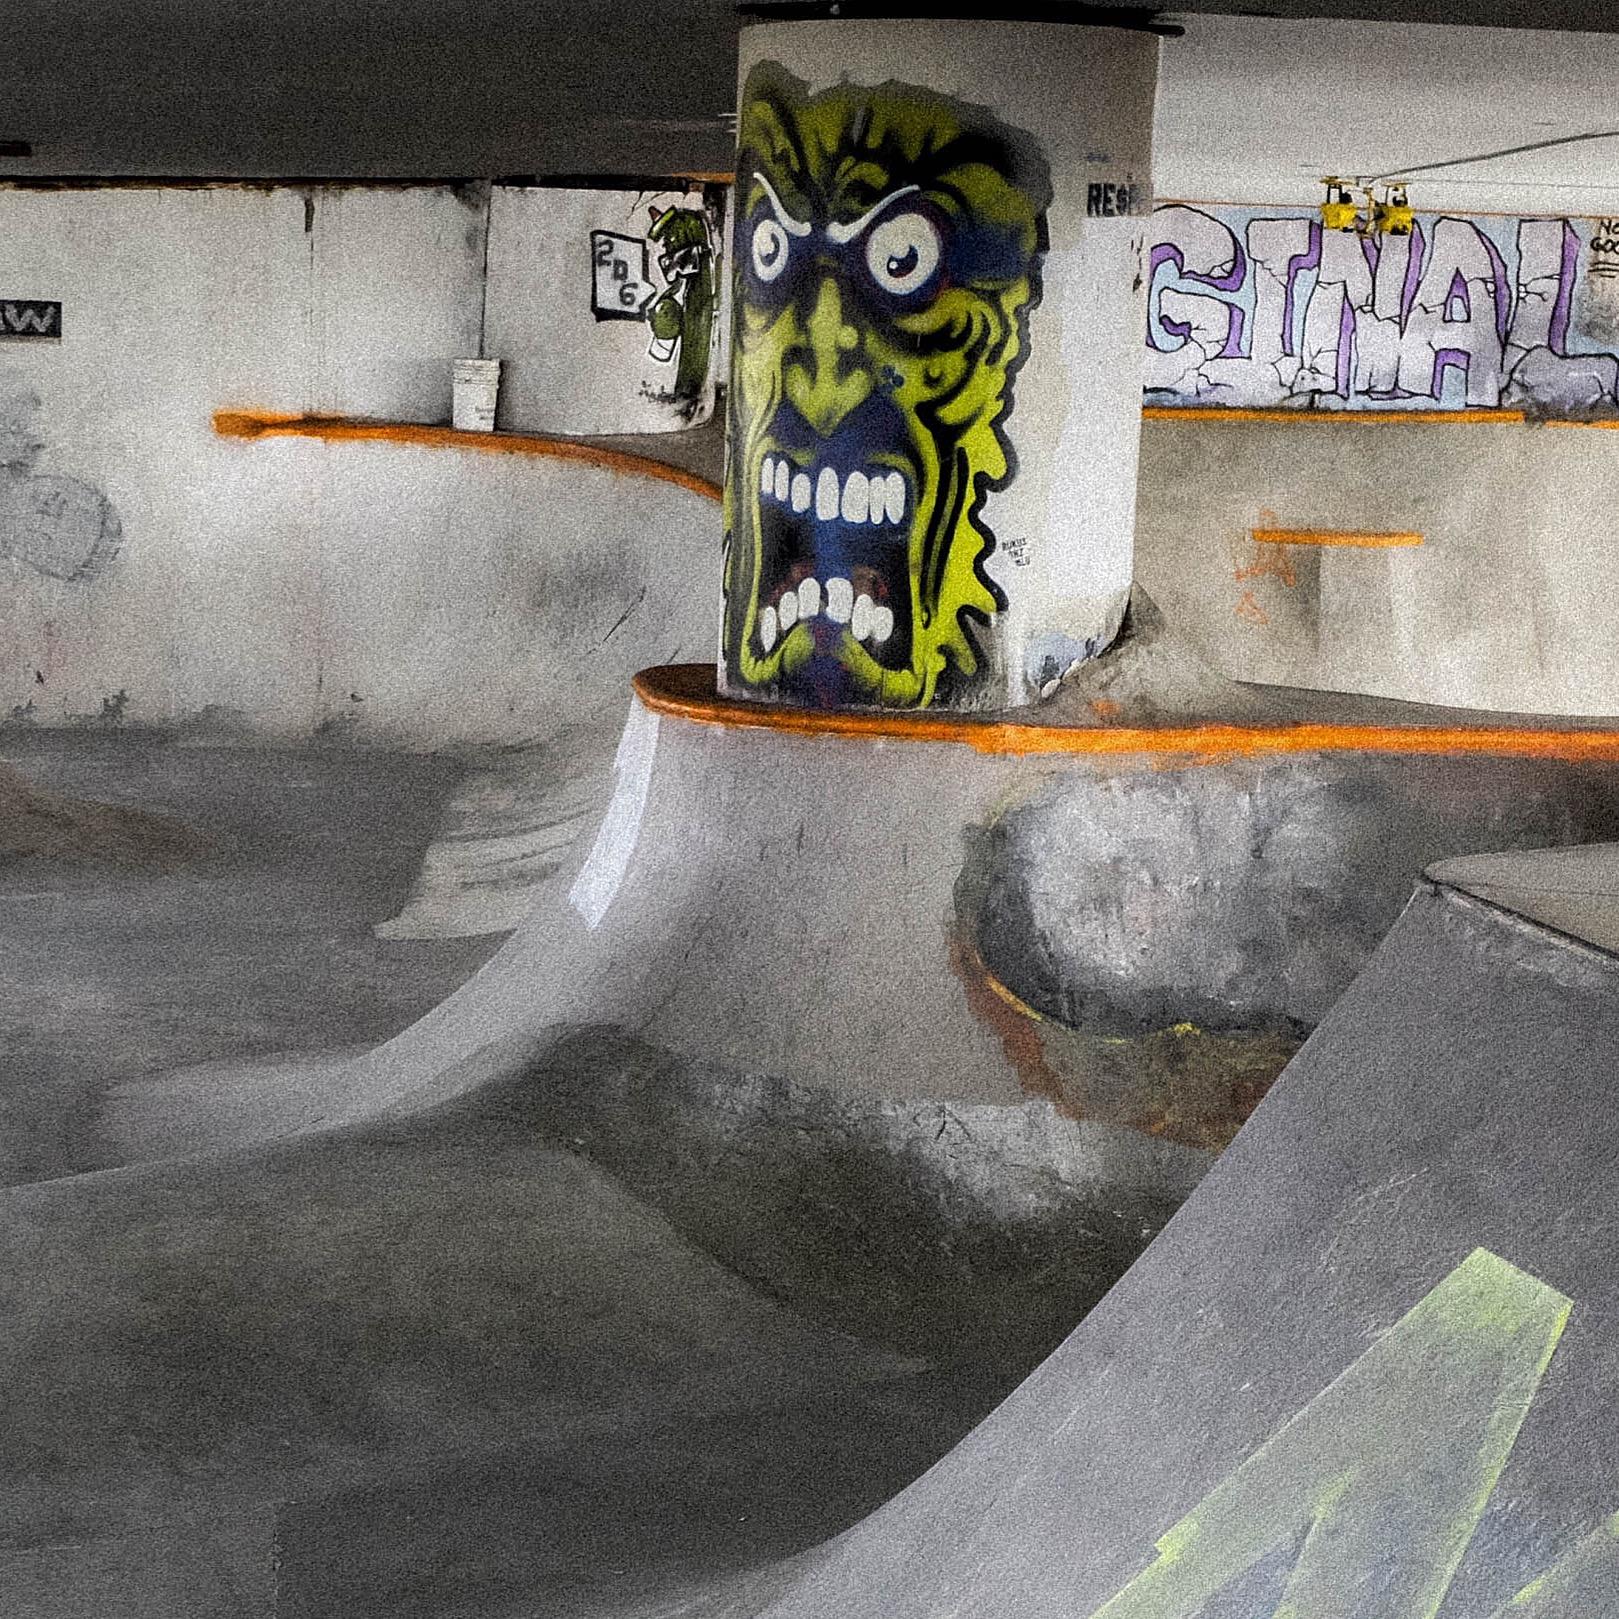 Union-of-Makers-Skate-Seattle-05.JPG